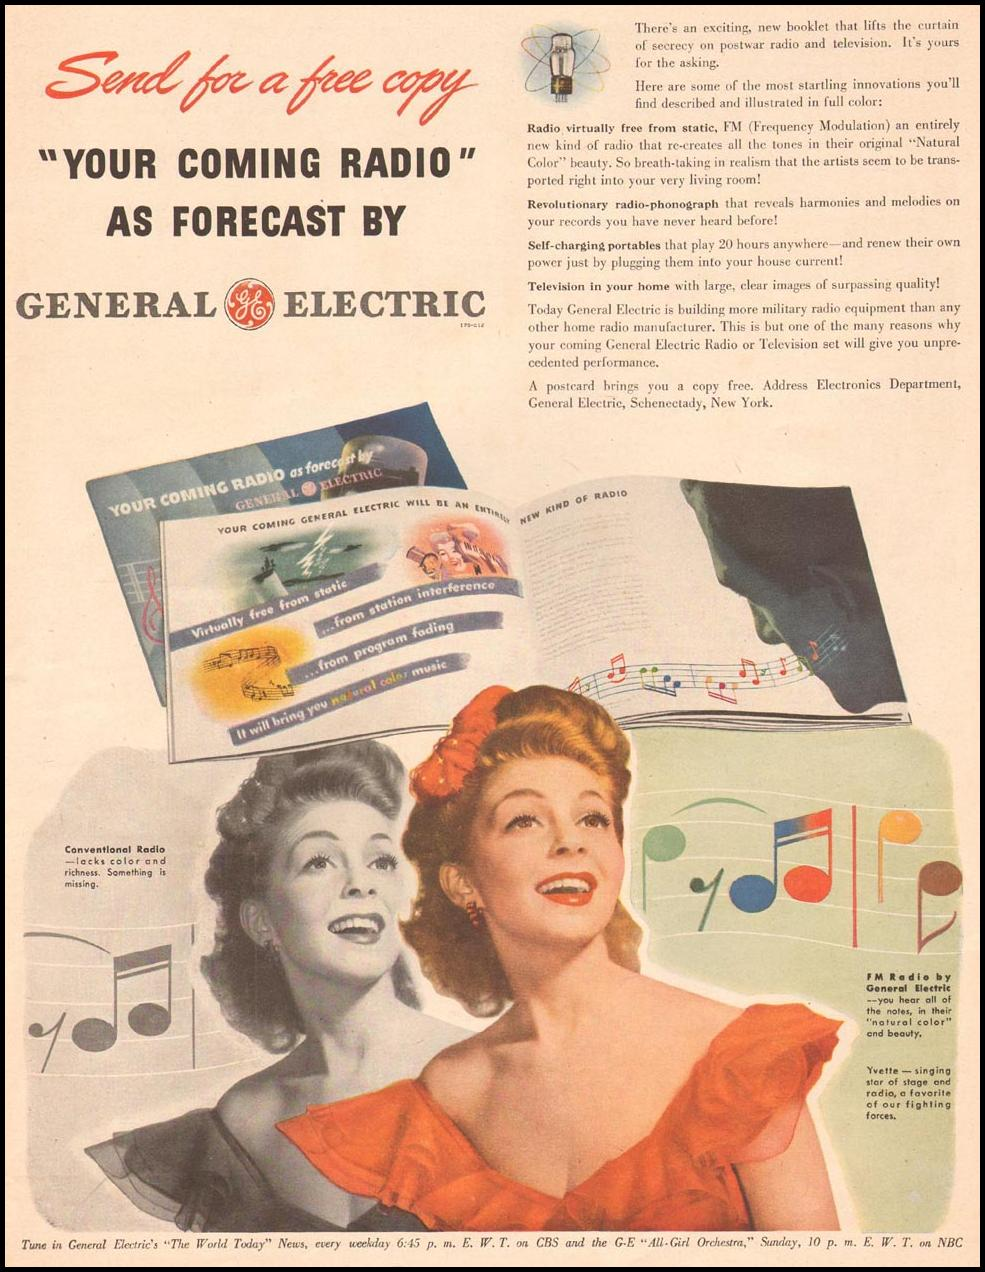 GENERAL ELECTRIC RADIOS LIFE 11/13/1944 p. 15